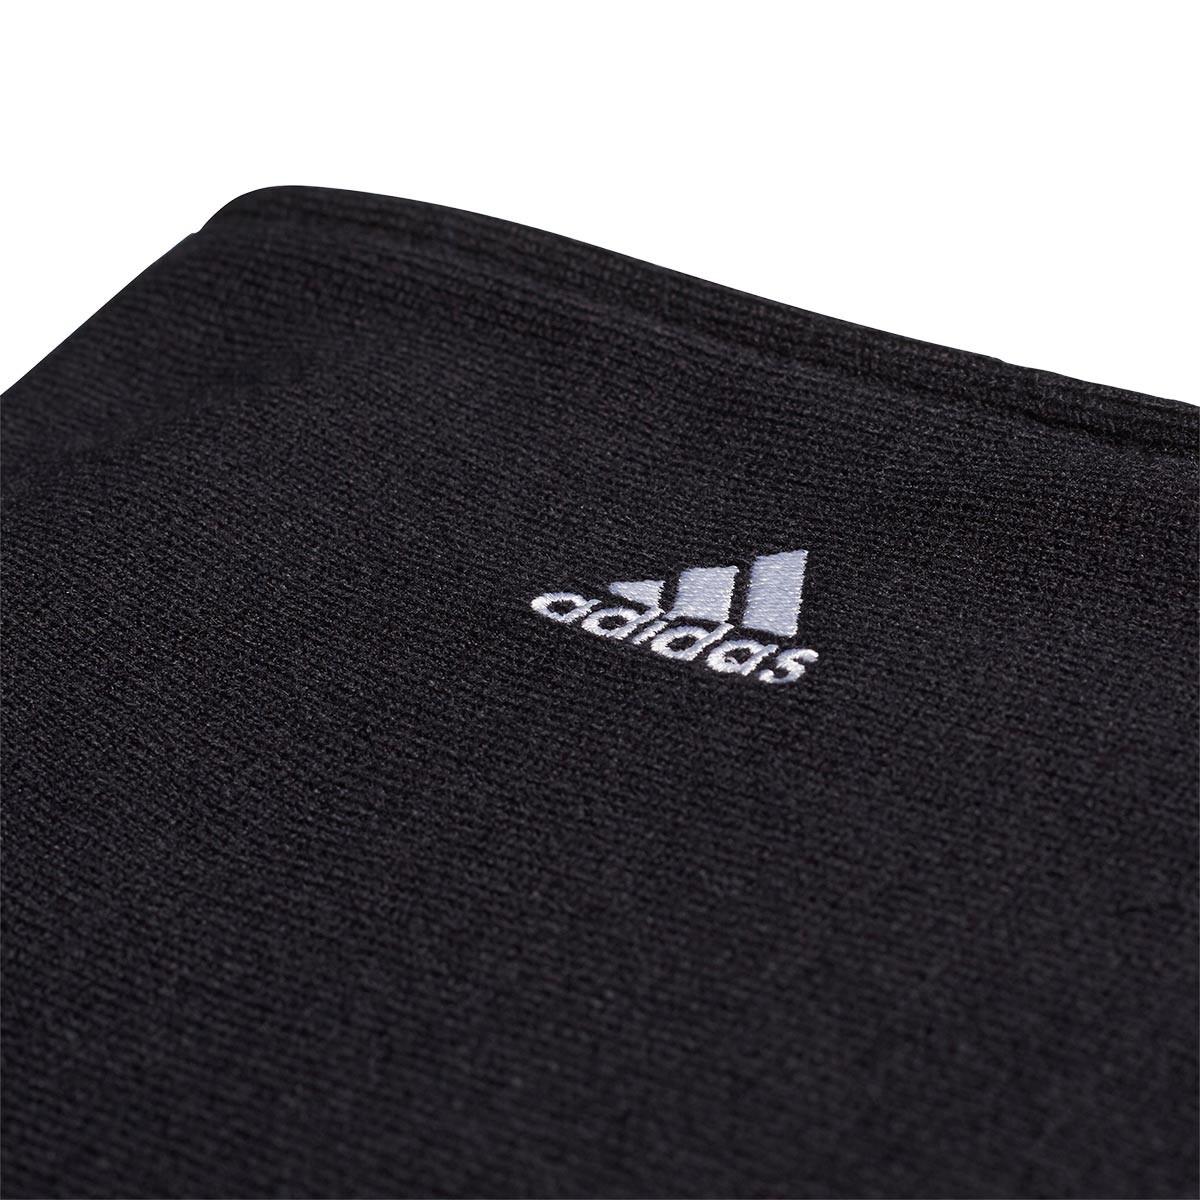 florero inversión Alboroto  Neck Warmer adidas Neckwarmer Black-White - Football store Fútbol Emotion